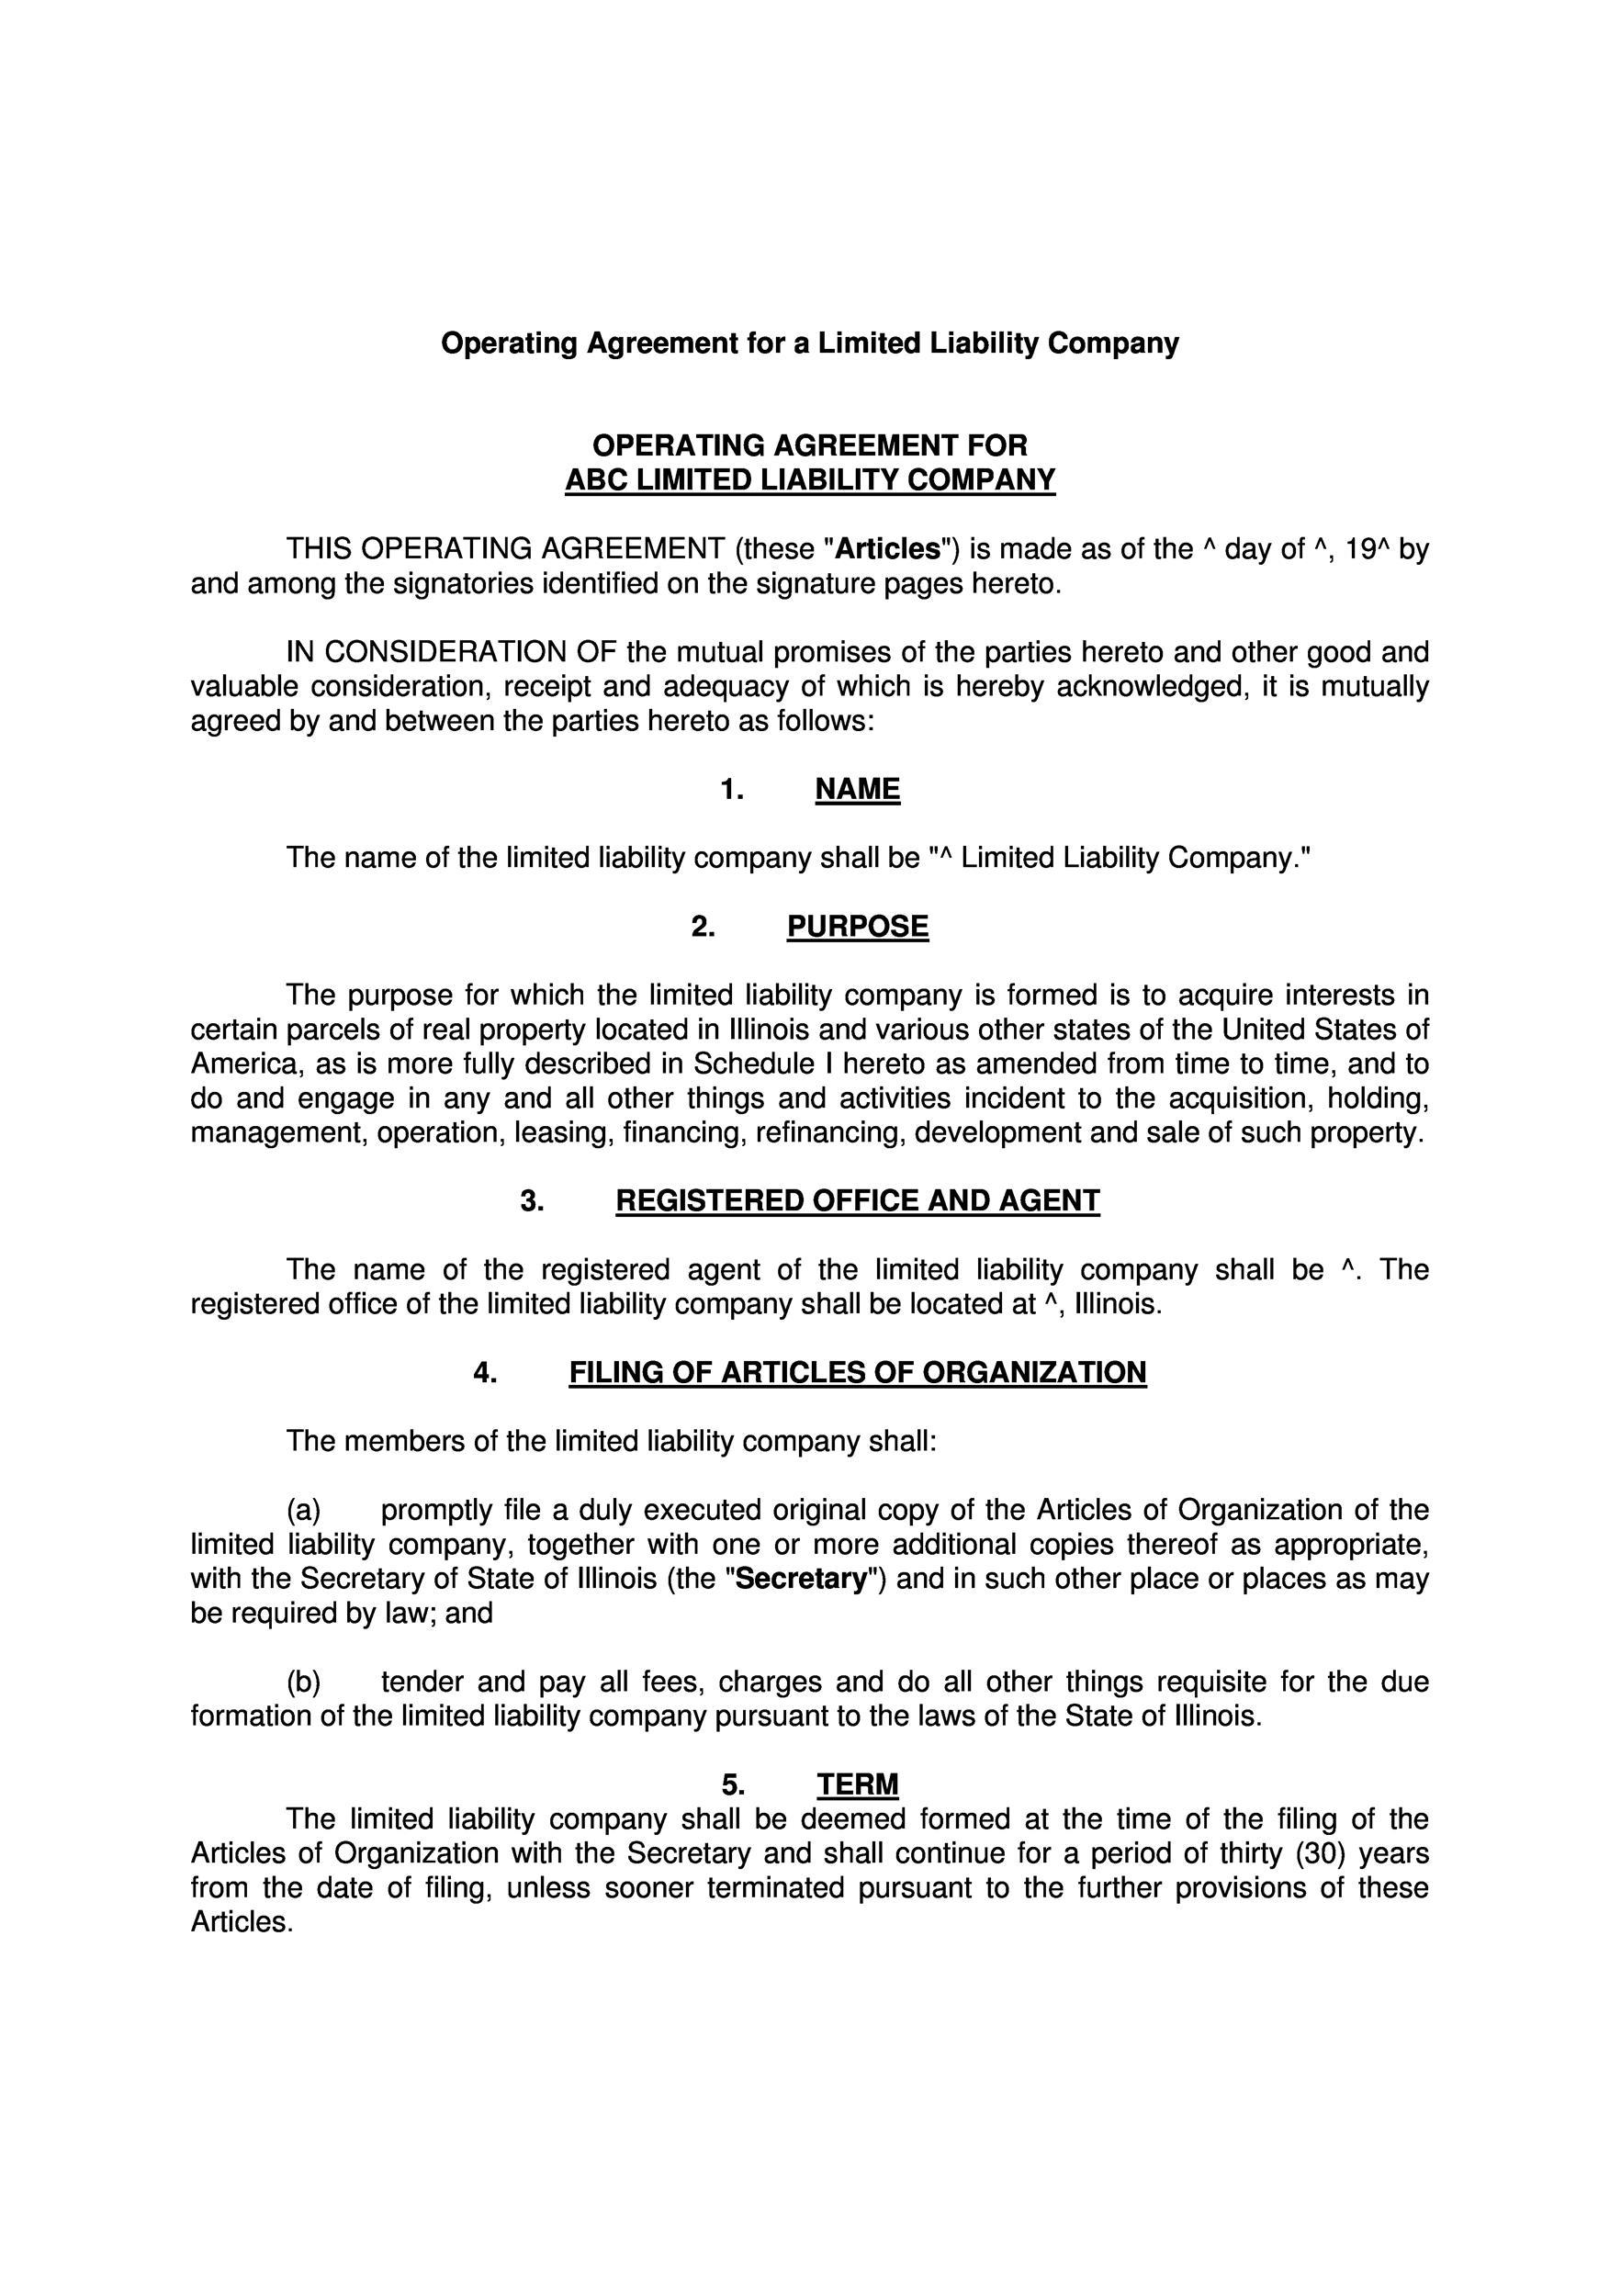 operating agreement template llc - Pinarkubkireklamowe